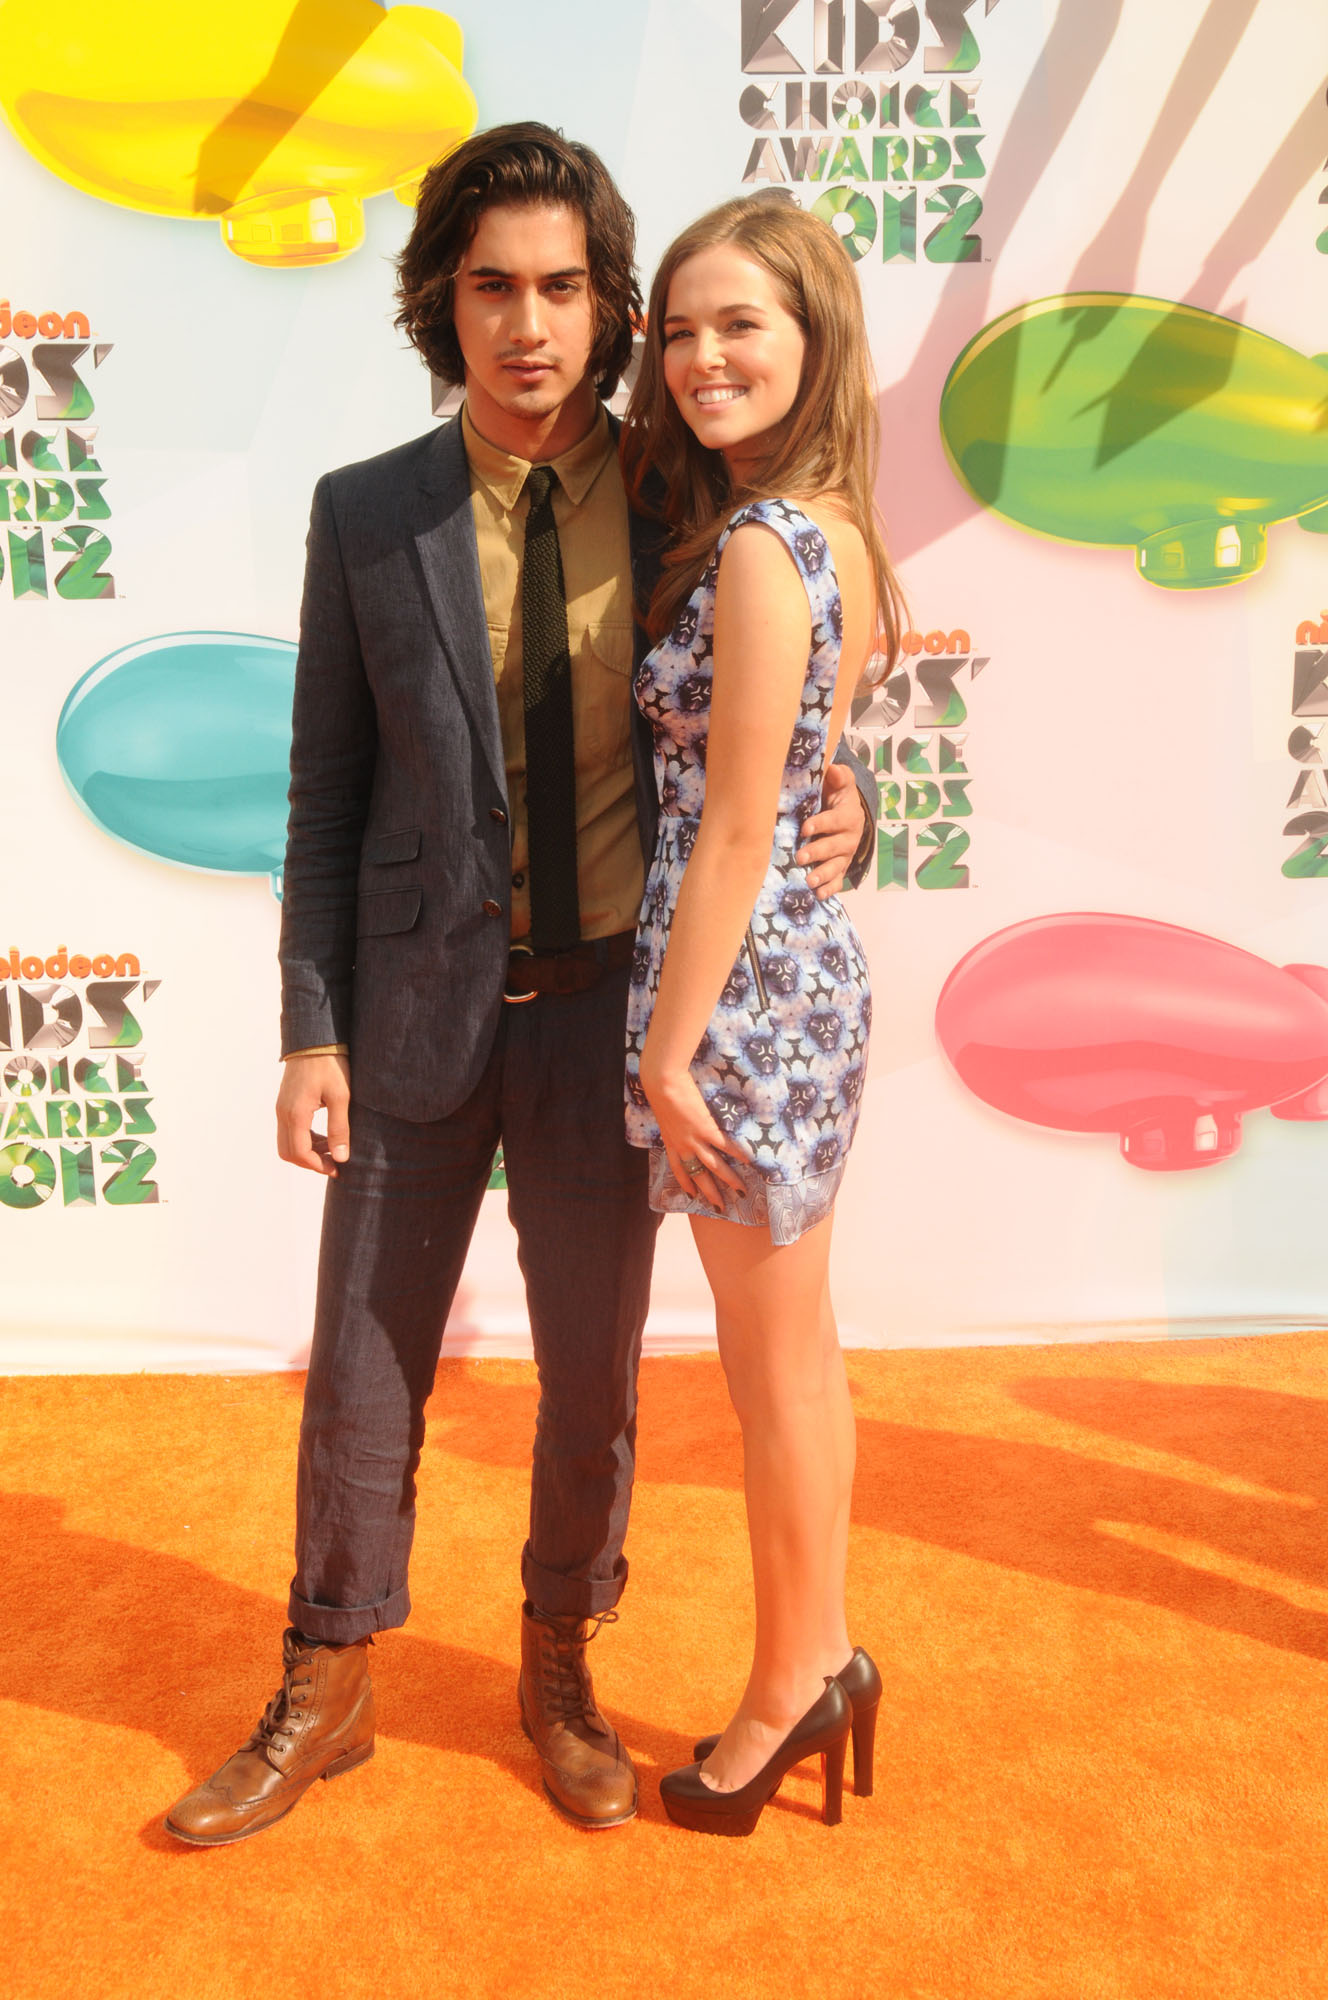 358553428_CFF_Zoey_Deutch_Nickelodeons_25th_Annual_Kids_Choice_Awards_In_LA_March_31_2012_022_122_157lo.jpg